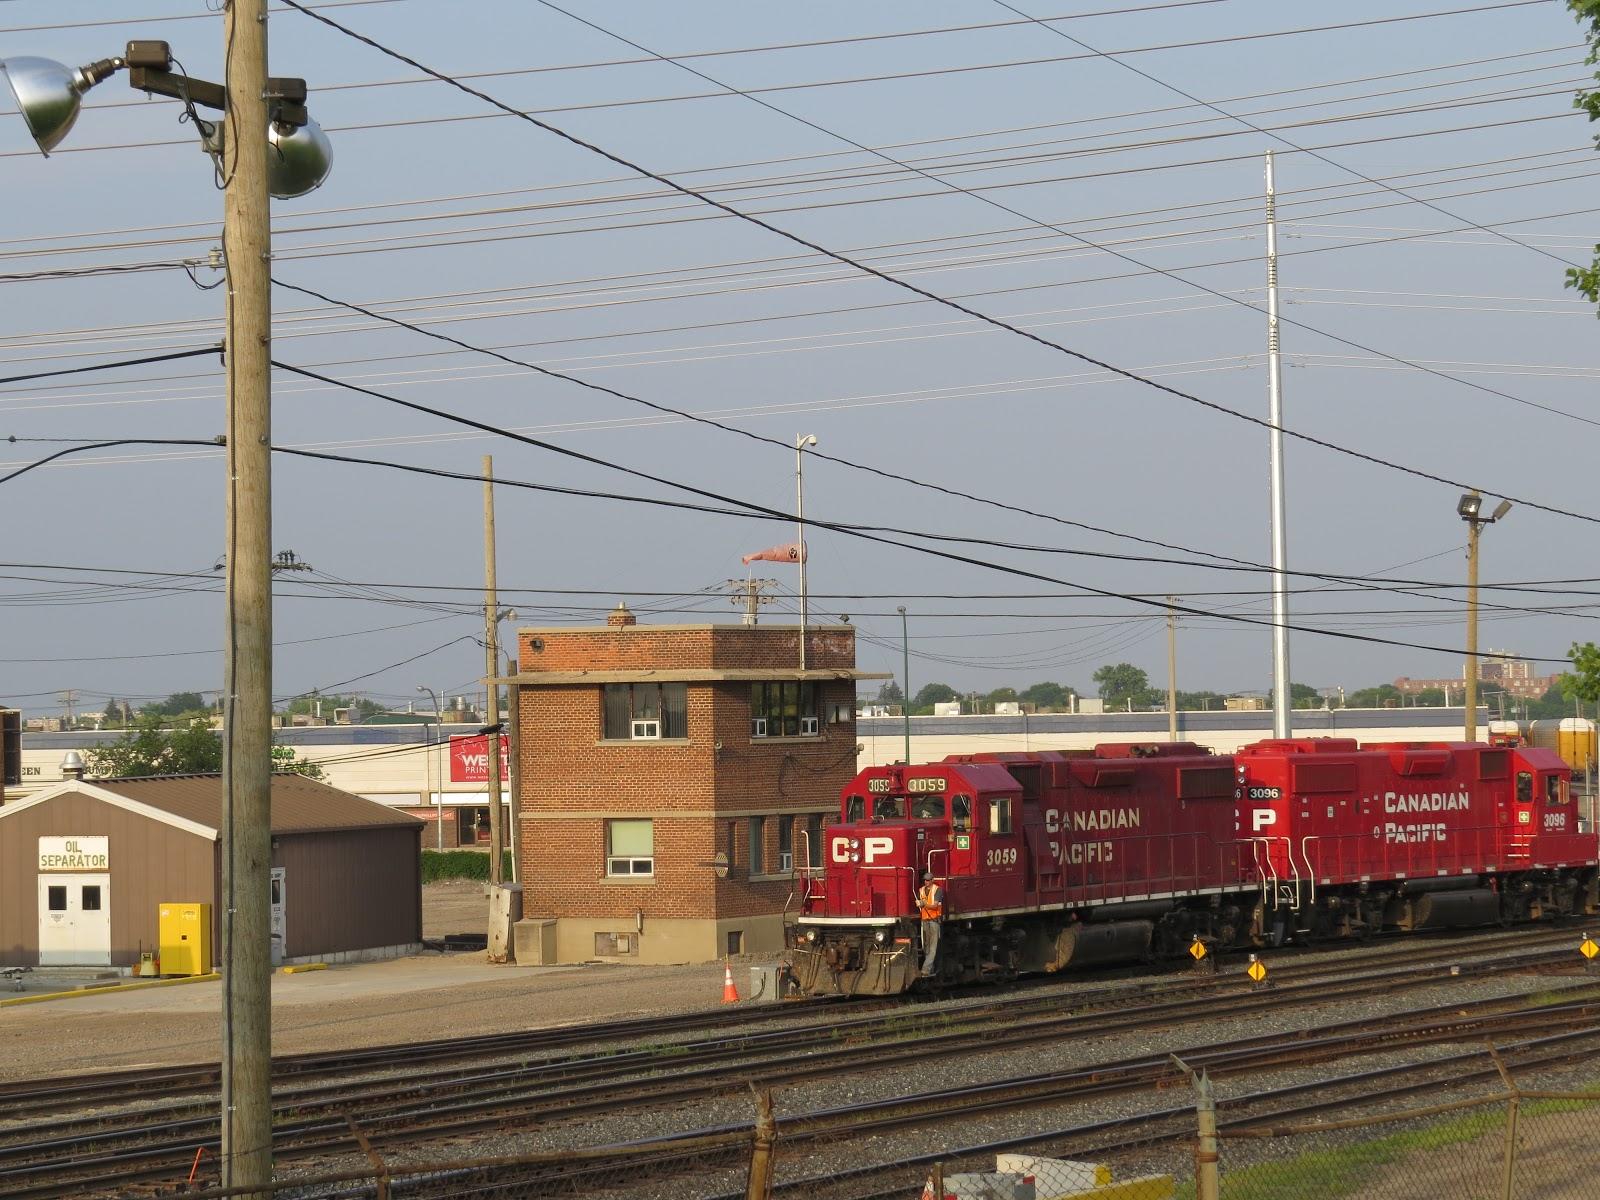 Winnipeg Model Railroad Club: Winnipeg's Rugby Tower dismantled by ...